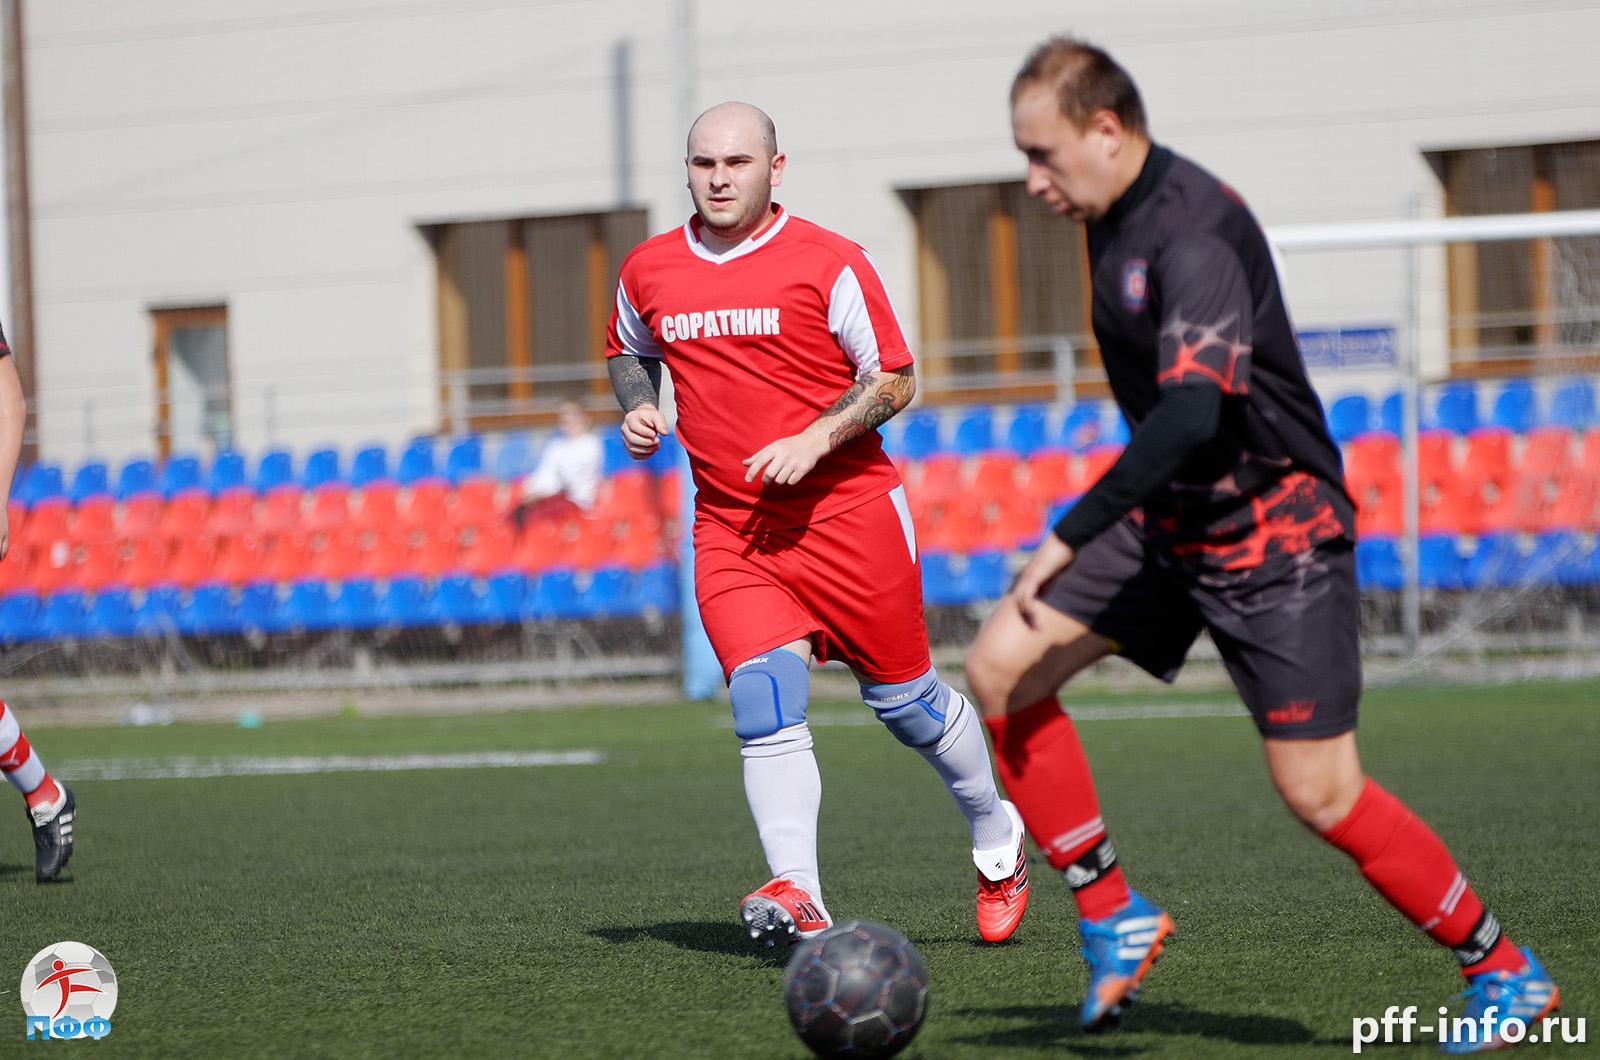 Премьер-лига ТДК. Обзор 5 тура